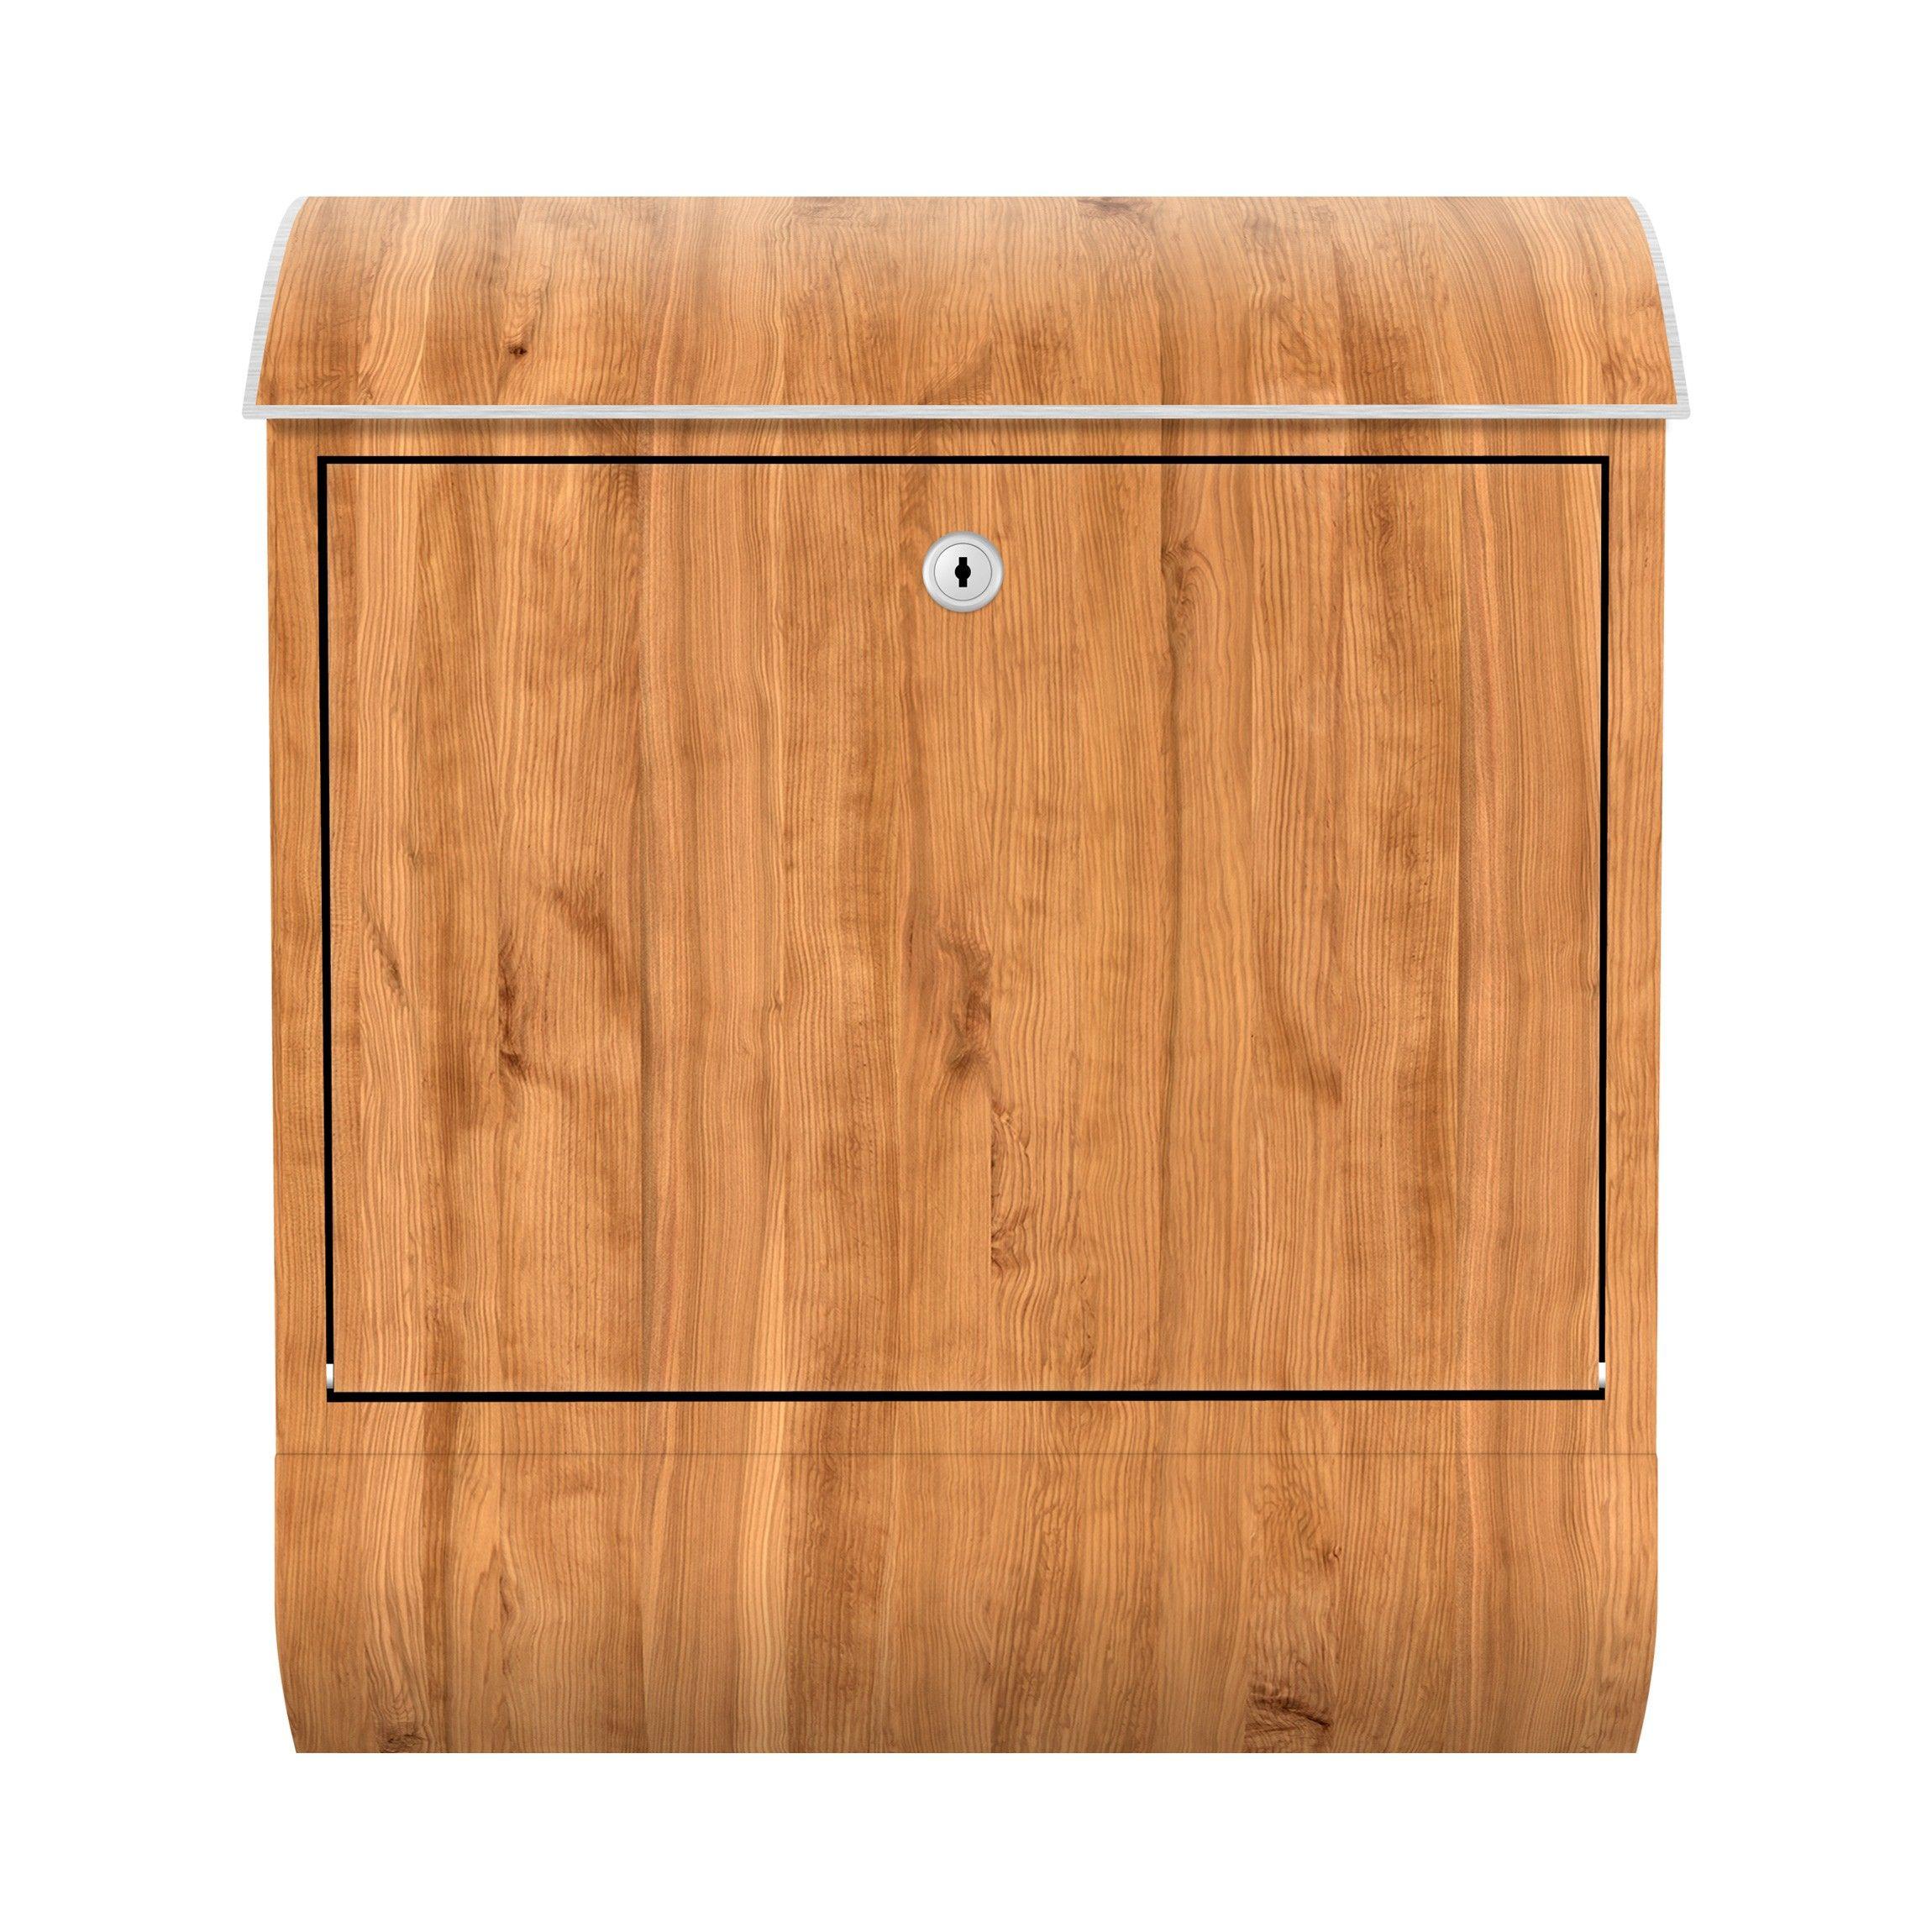 Briefkasten Holz Libanon Zede Holzoptik Wandbriefkasten Braun Briefkasten Holz Briefkasten Design Briefkasten